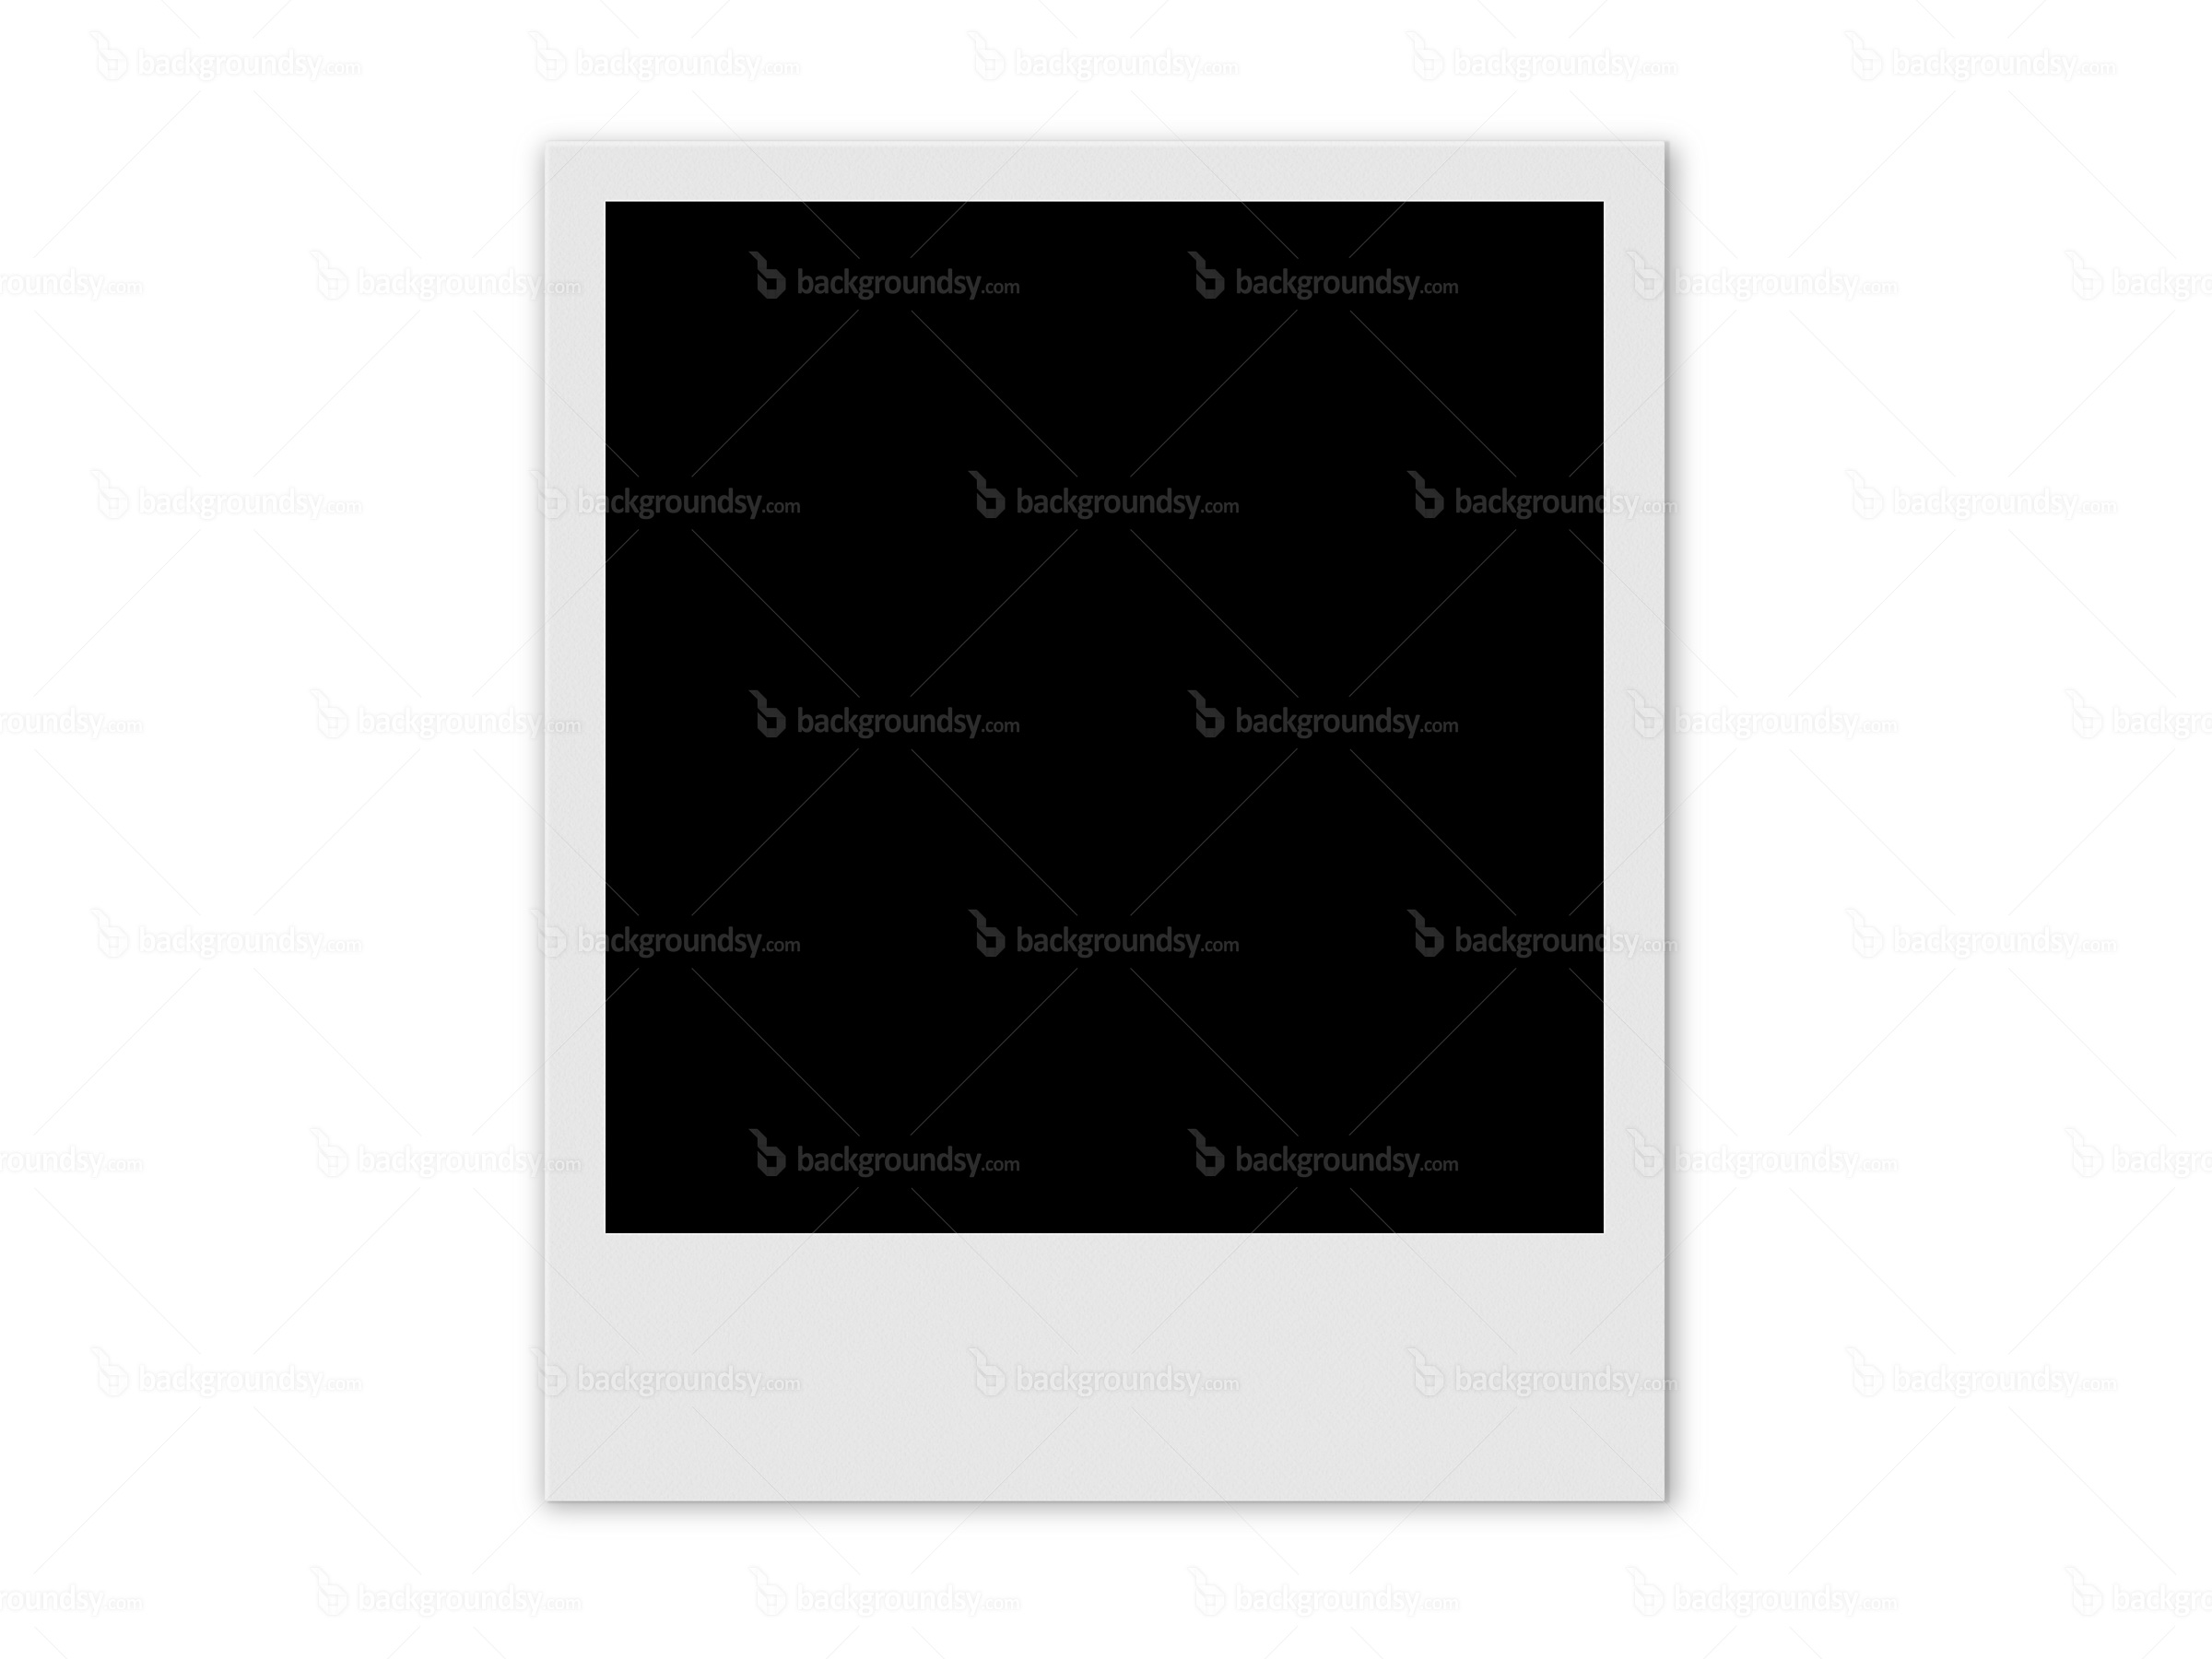 15 polaroid mailing template psd images polaroid frames psd templates polaroid frames psd. Black Bedroom Furniture Sets. Home Design Ideas